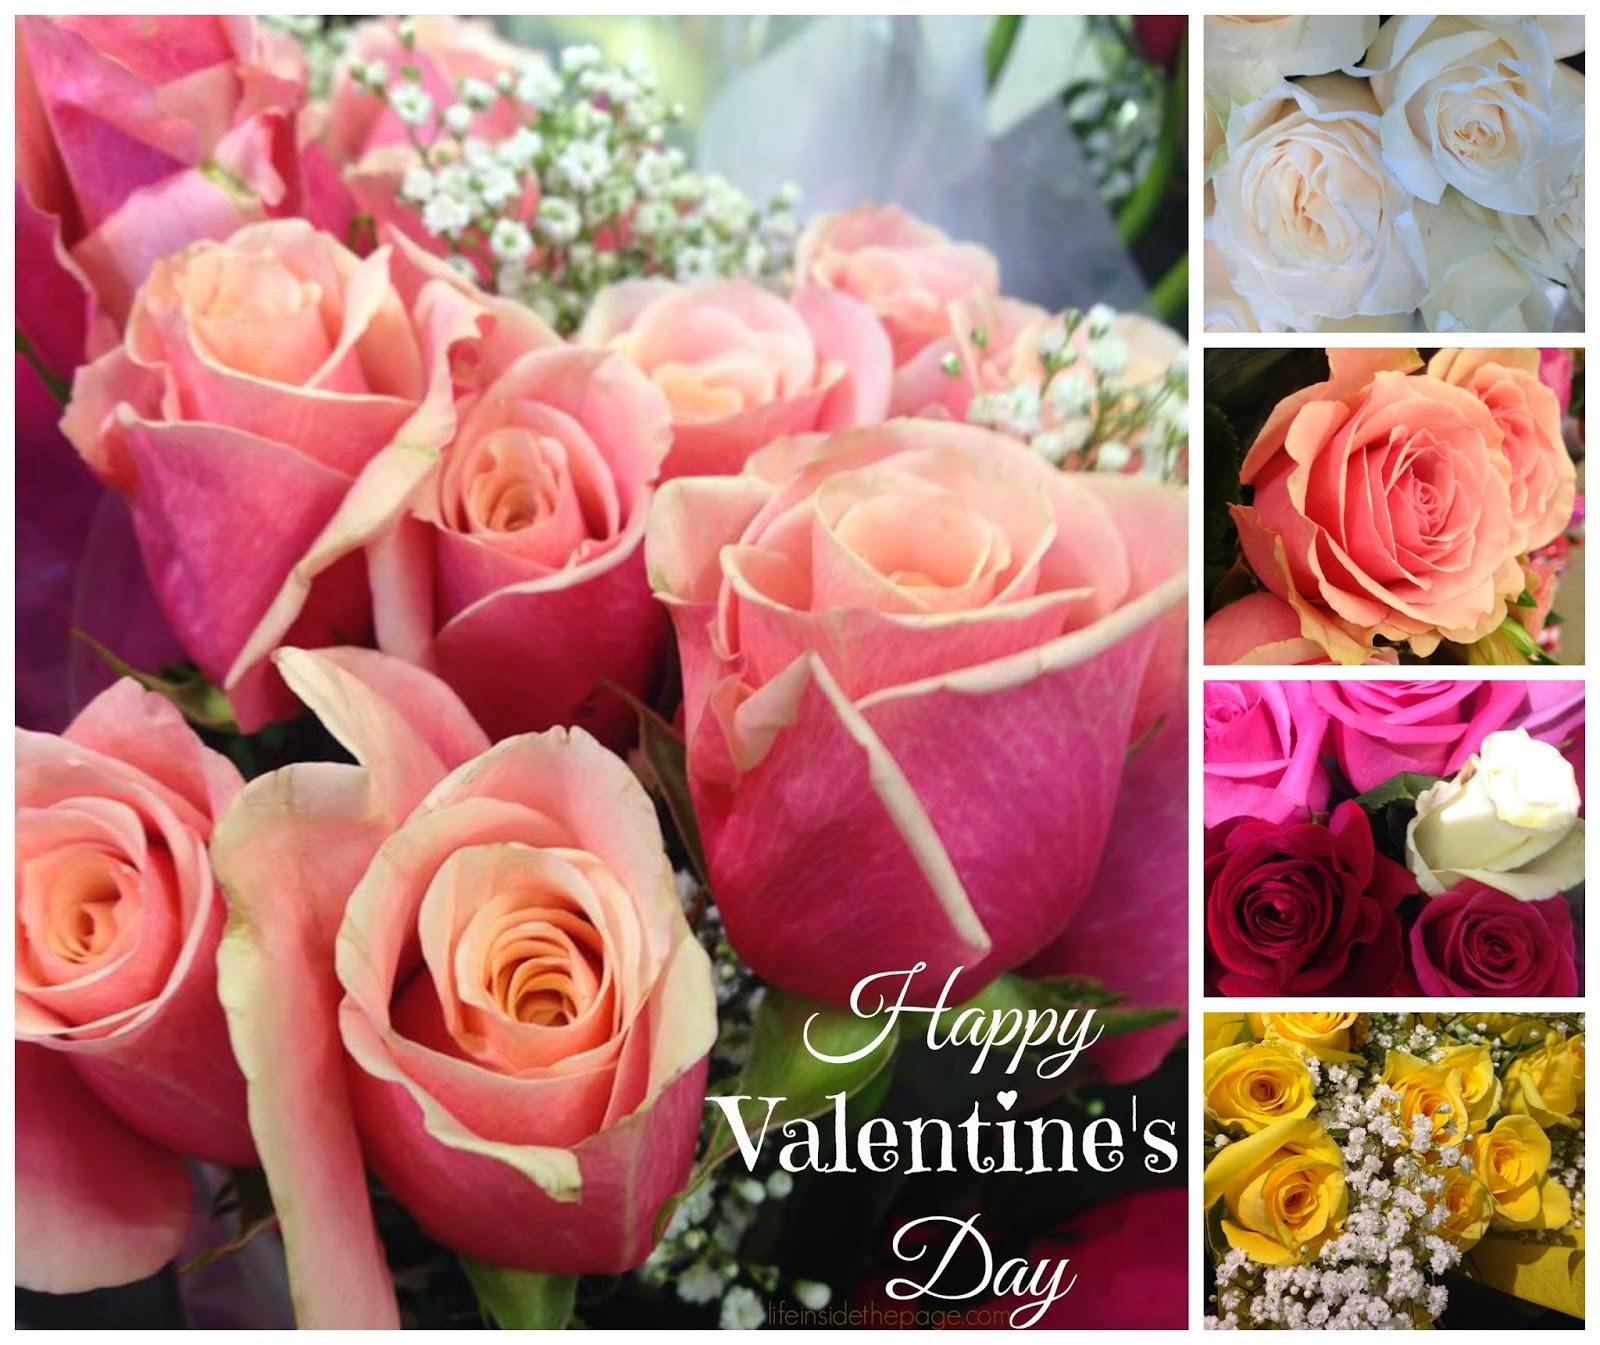 Happy Valentine's Day   February 14, 2015